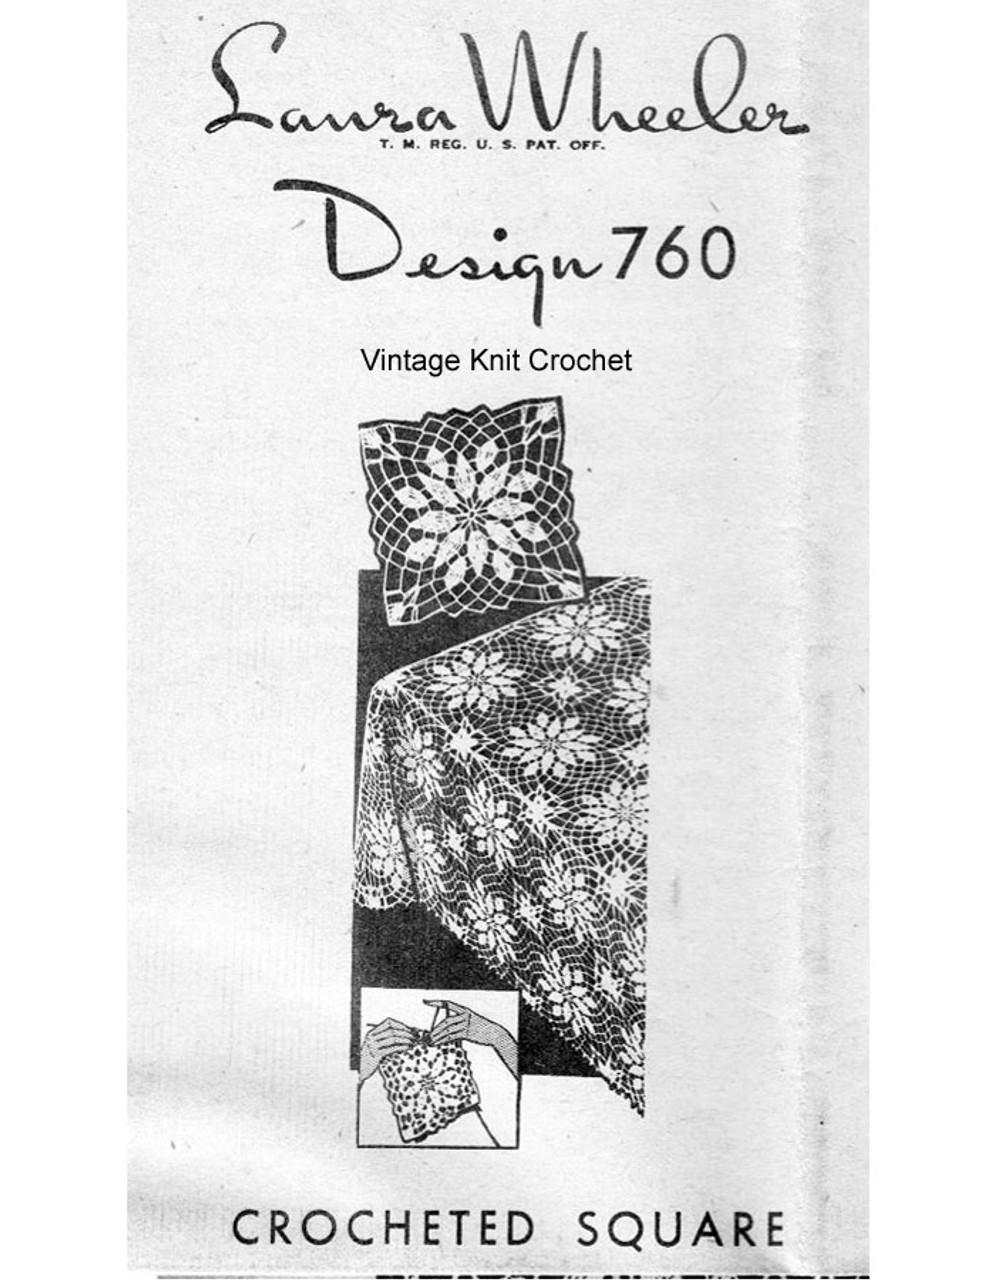 Flower Square Crochet Pattern, Tablecloth, Laura Wheeler 760